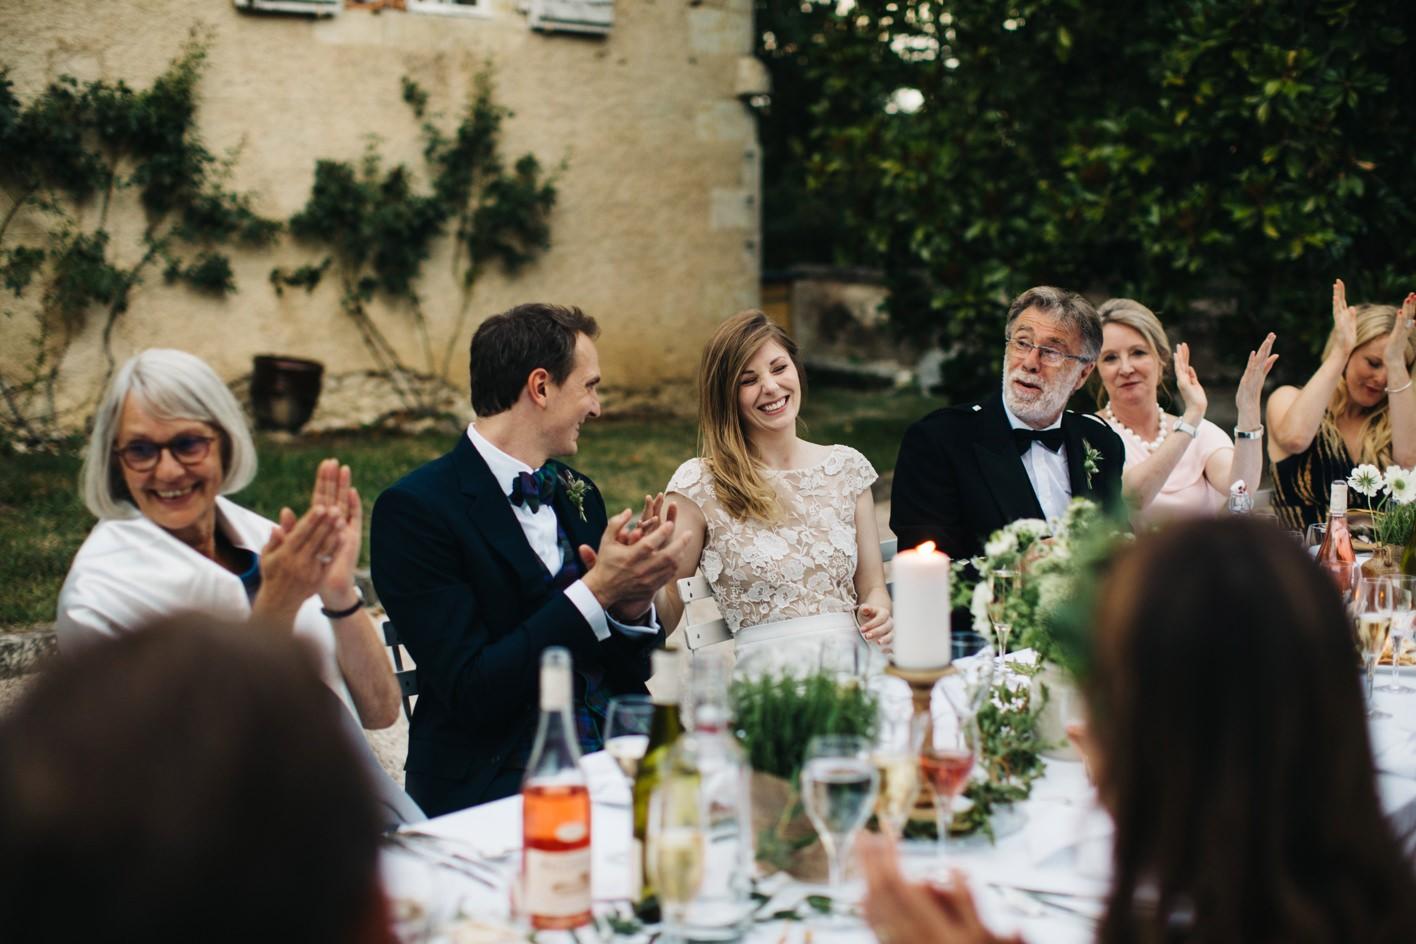 Chateau de lartigolle wedding near toulouse 127